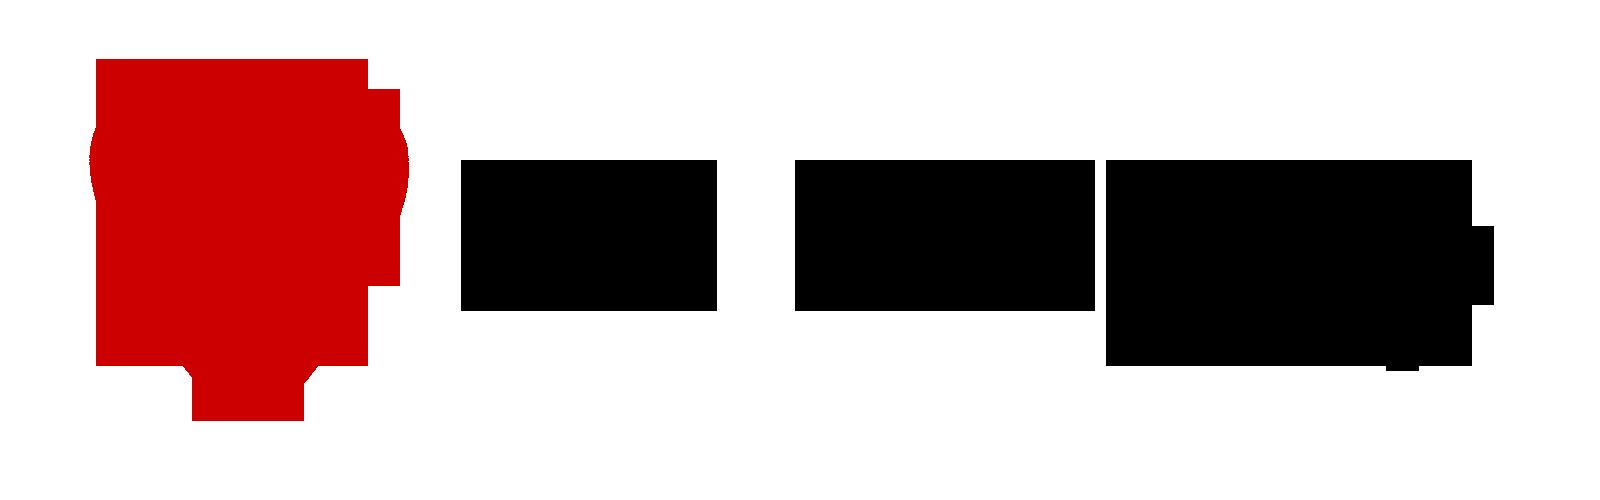 theBAKDROP logo